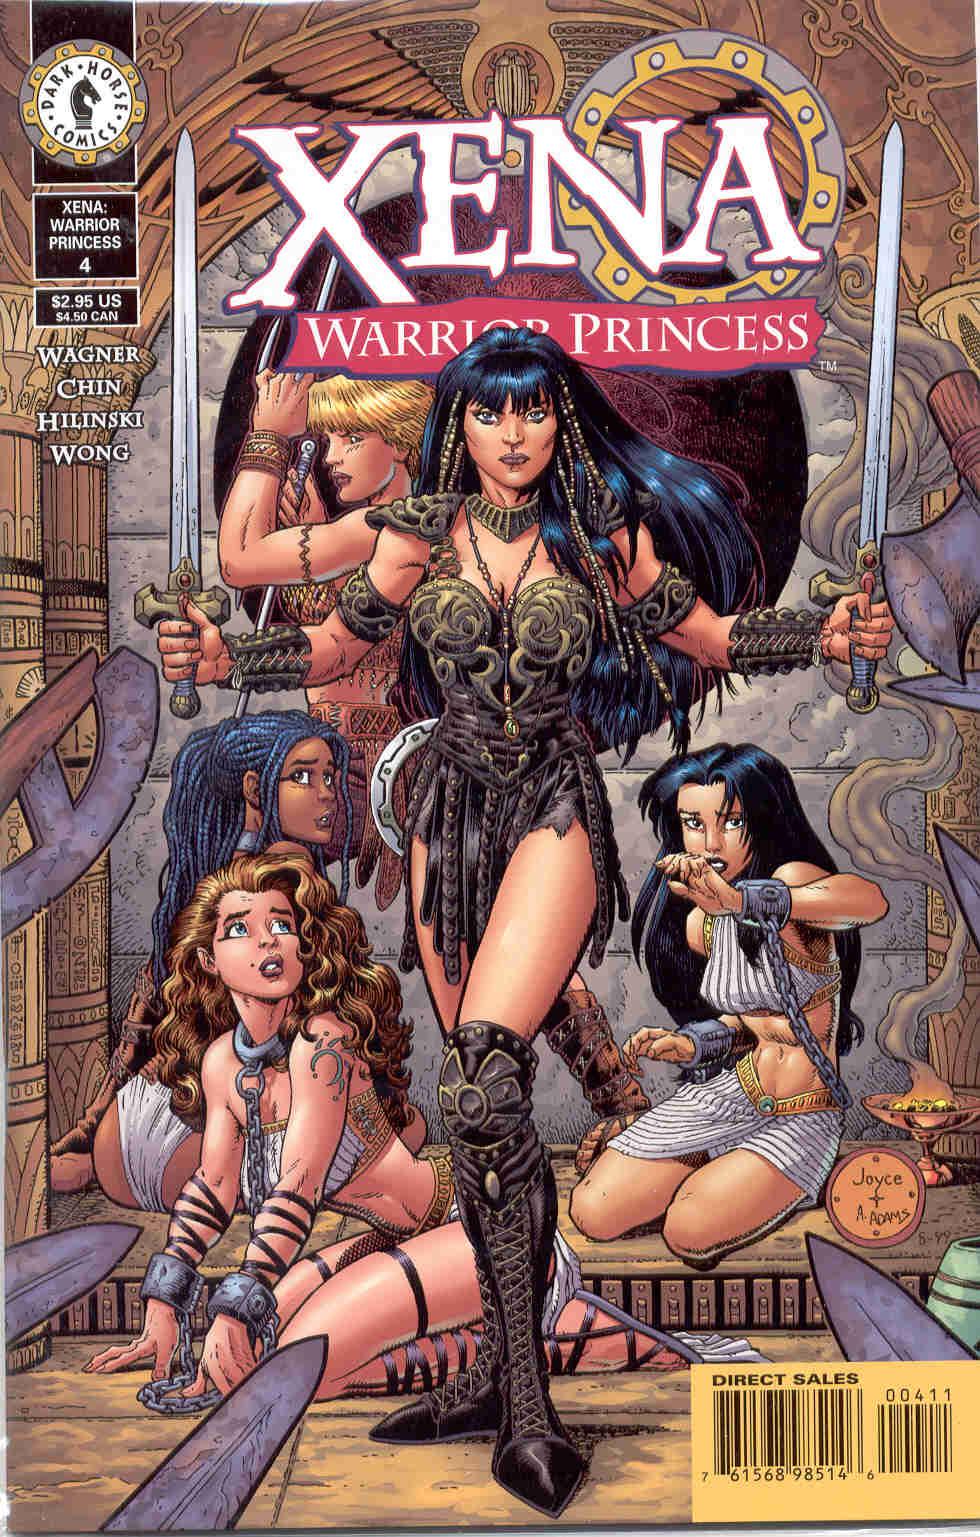 Lesbian xena warrior princess adult picture